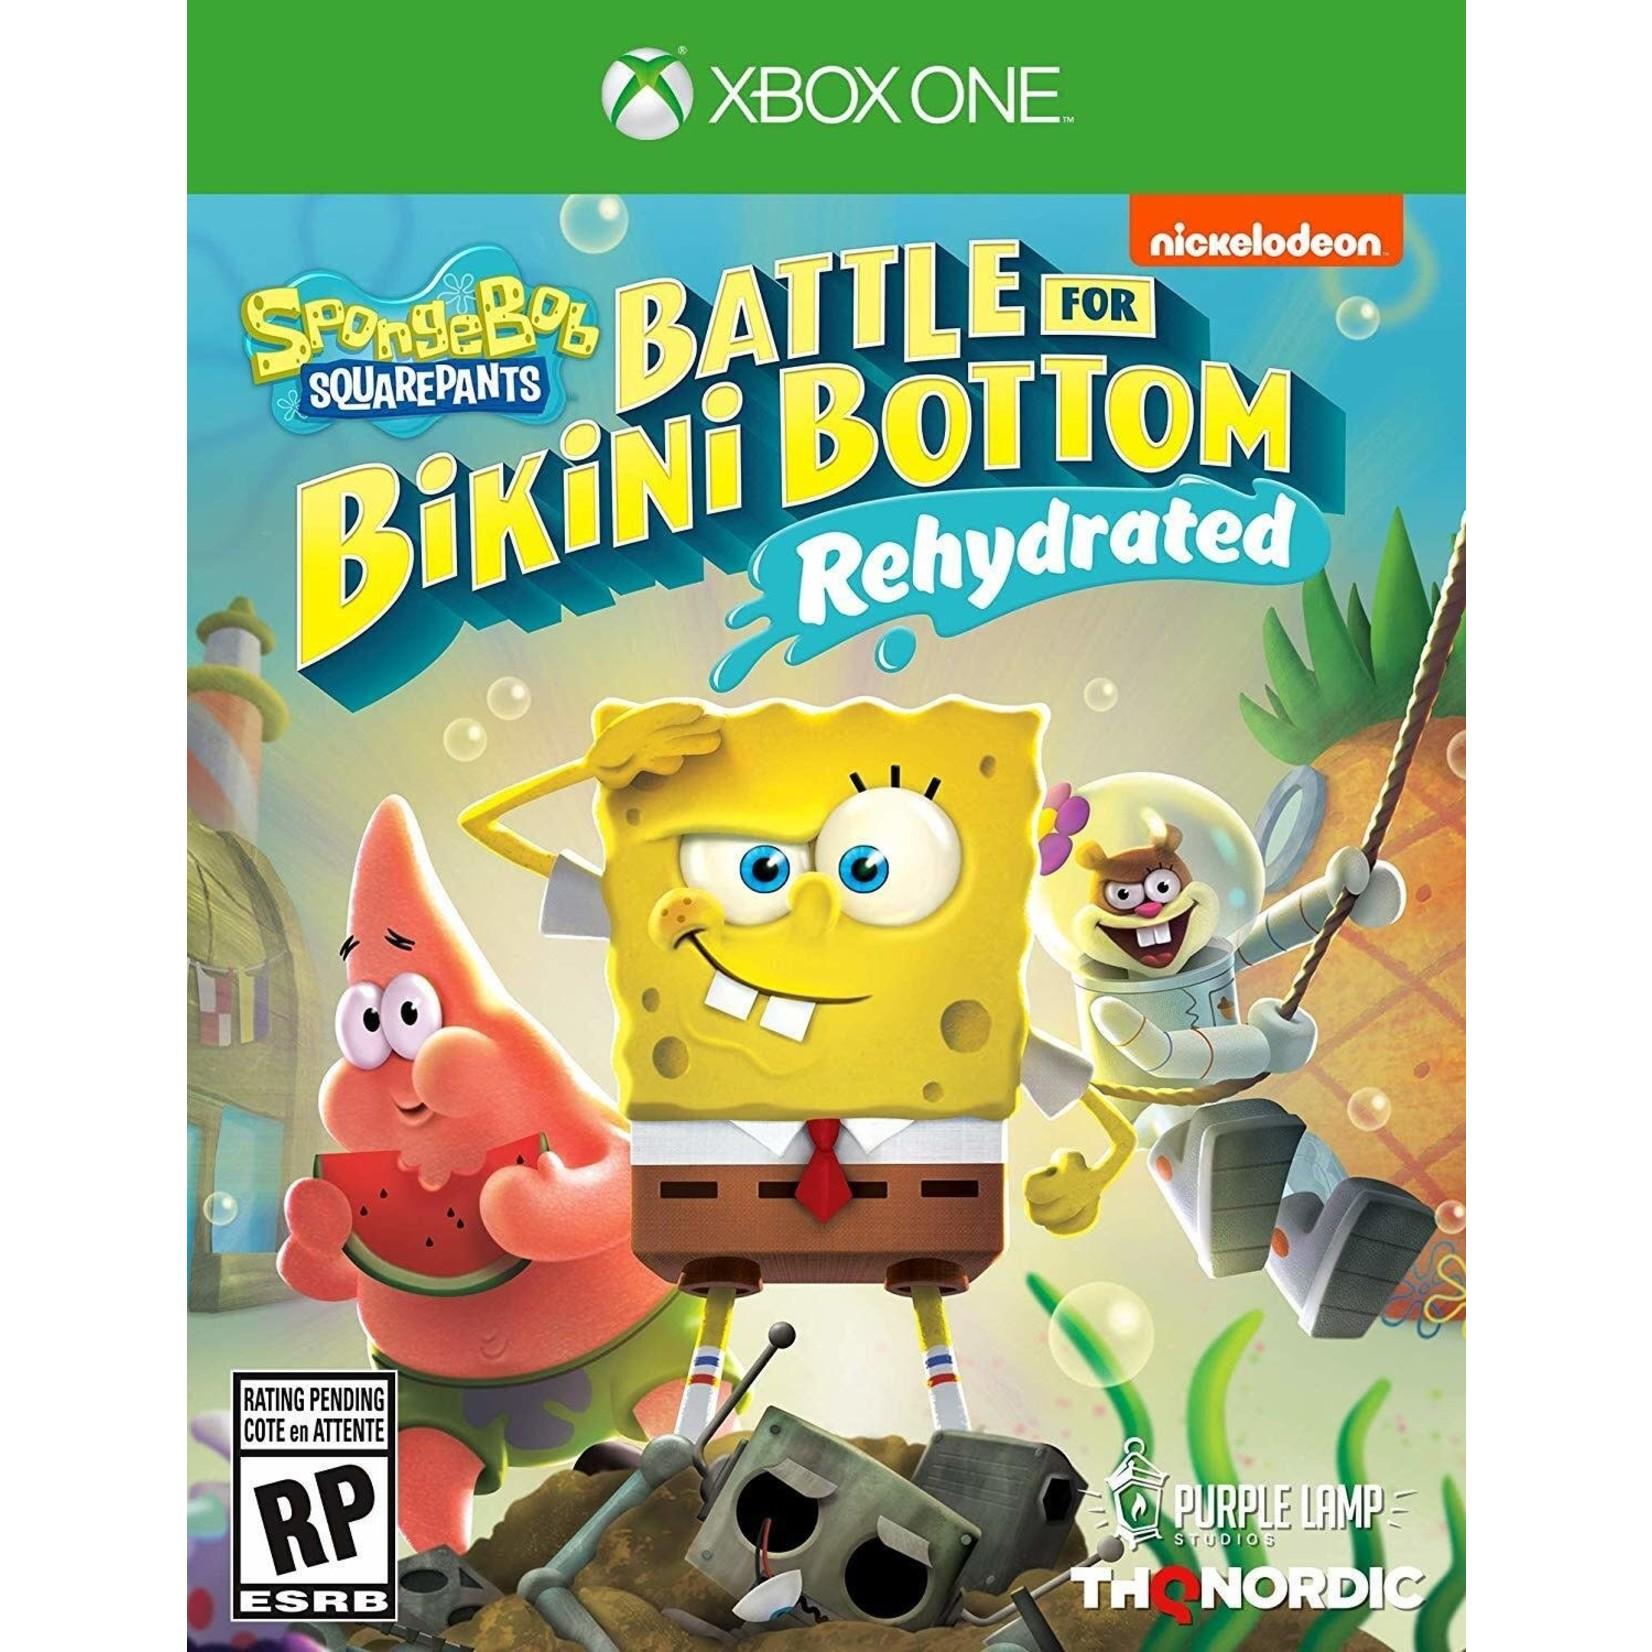 xb1u-Spongebob Squarepants Battle For Bikini Bottom: Rehydrated